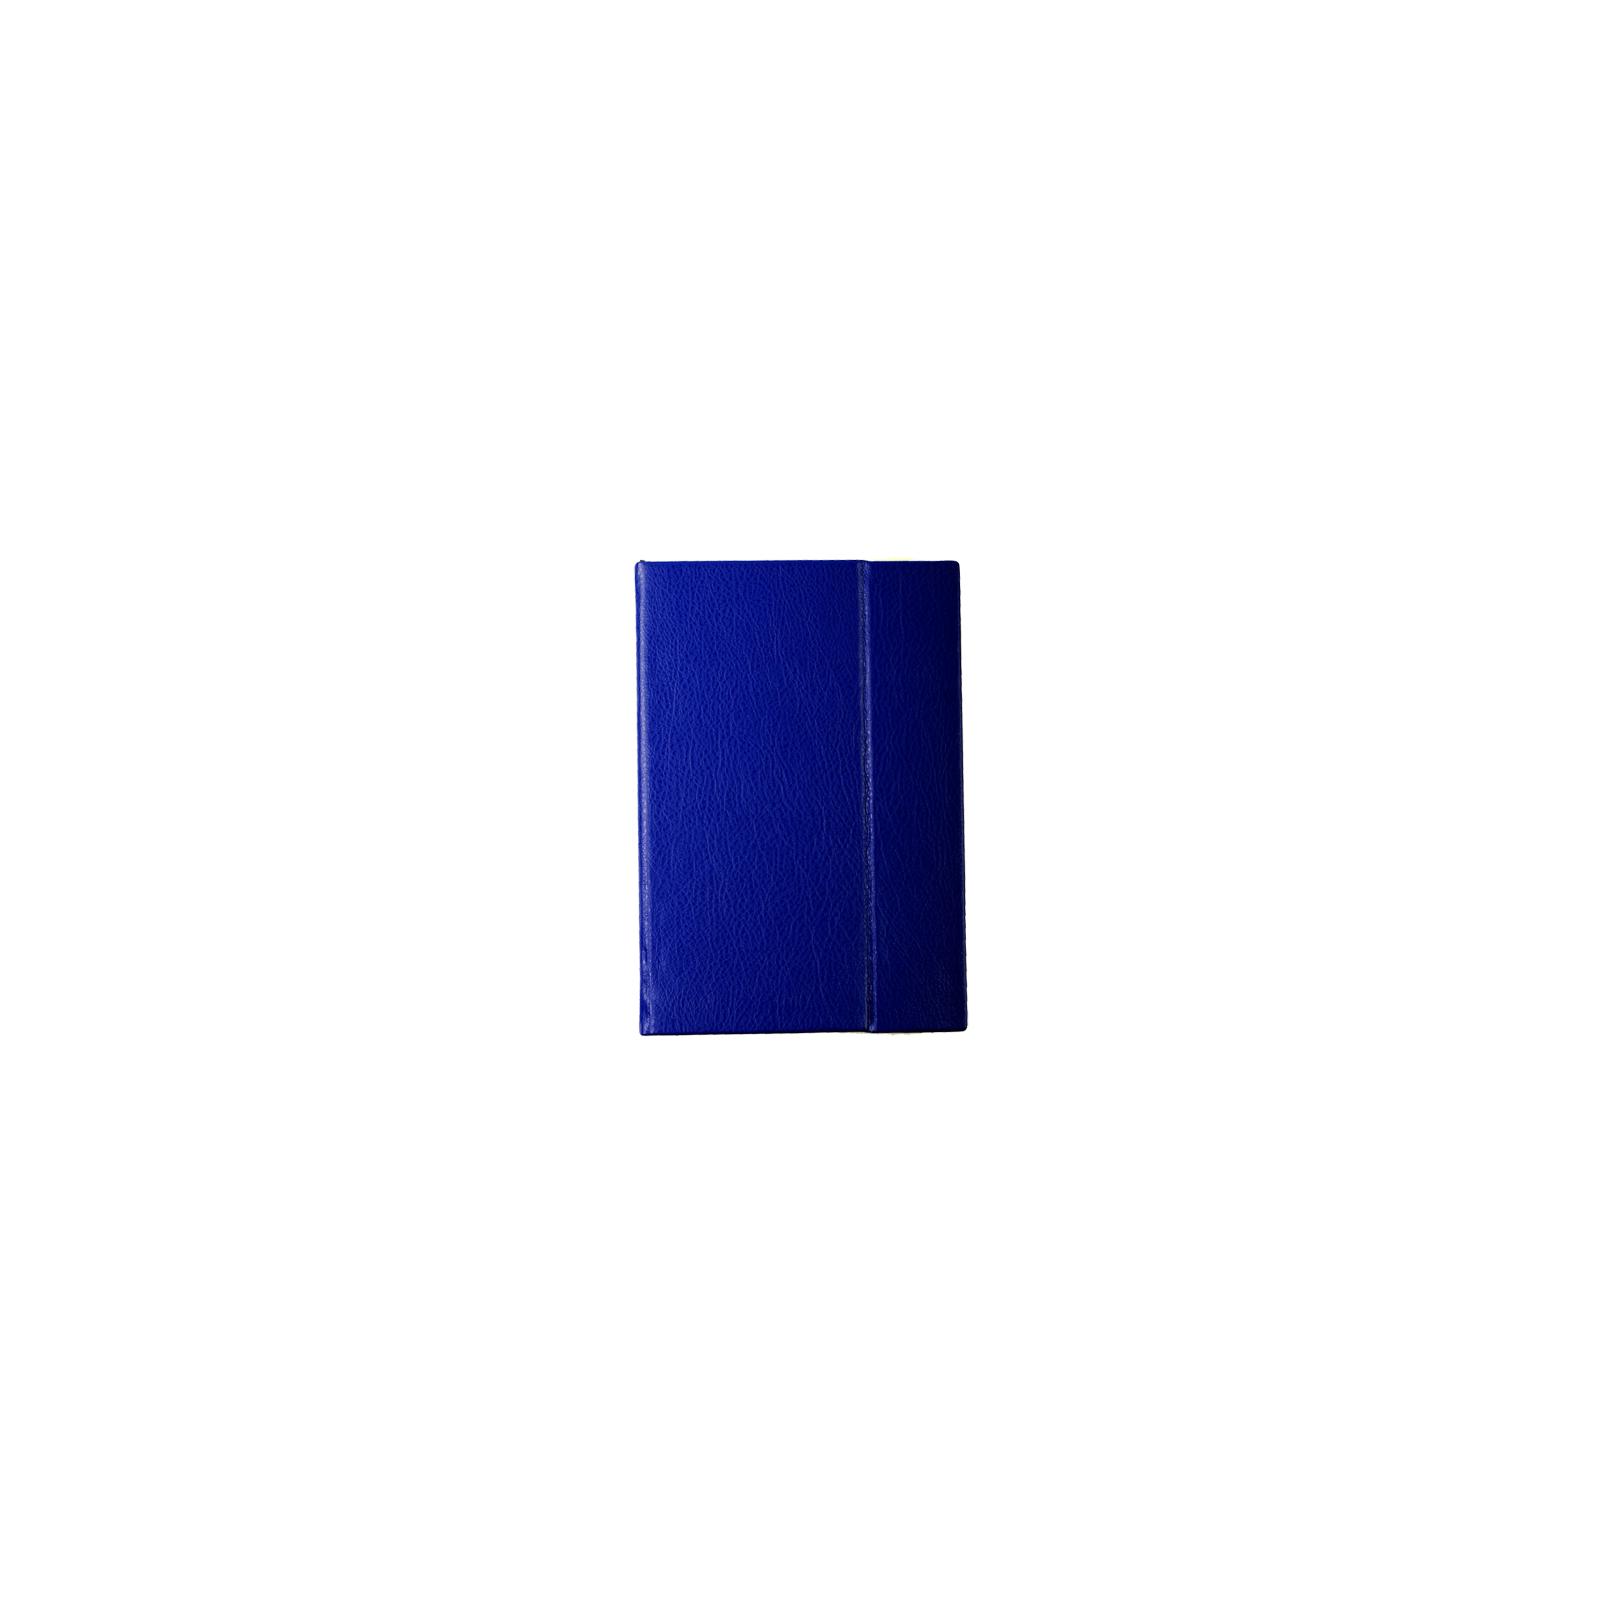 Чехол для планшета Vento 7 Desire Bright -blue изображение 2